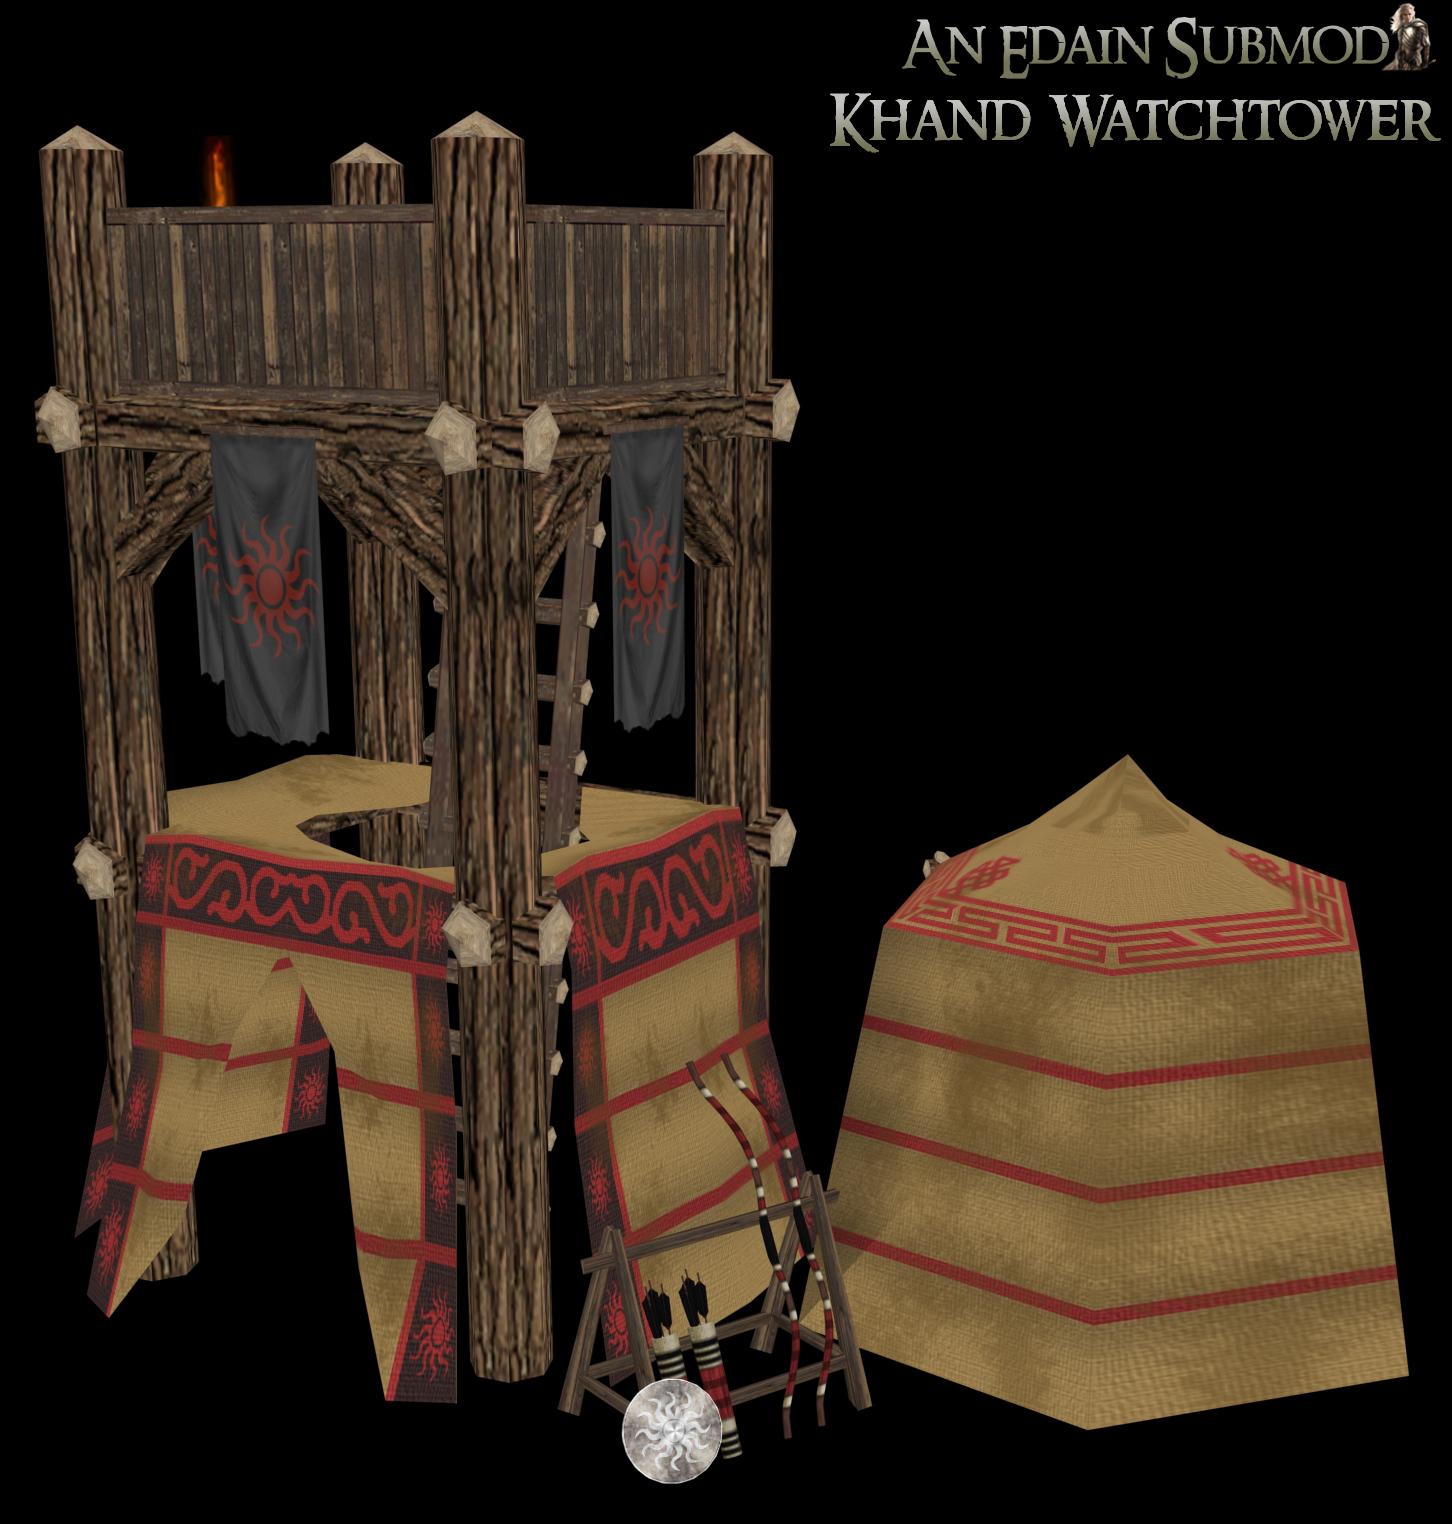 Khand Watchtower